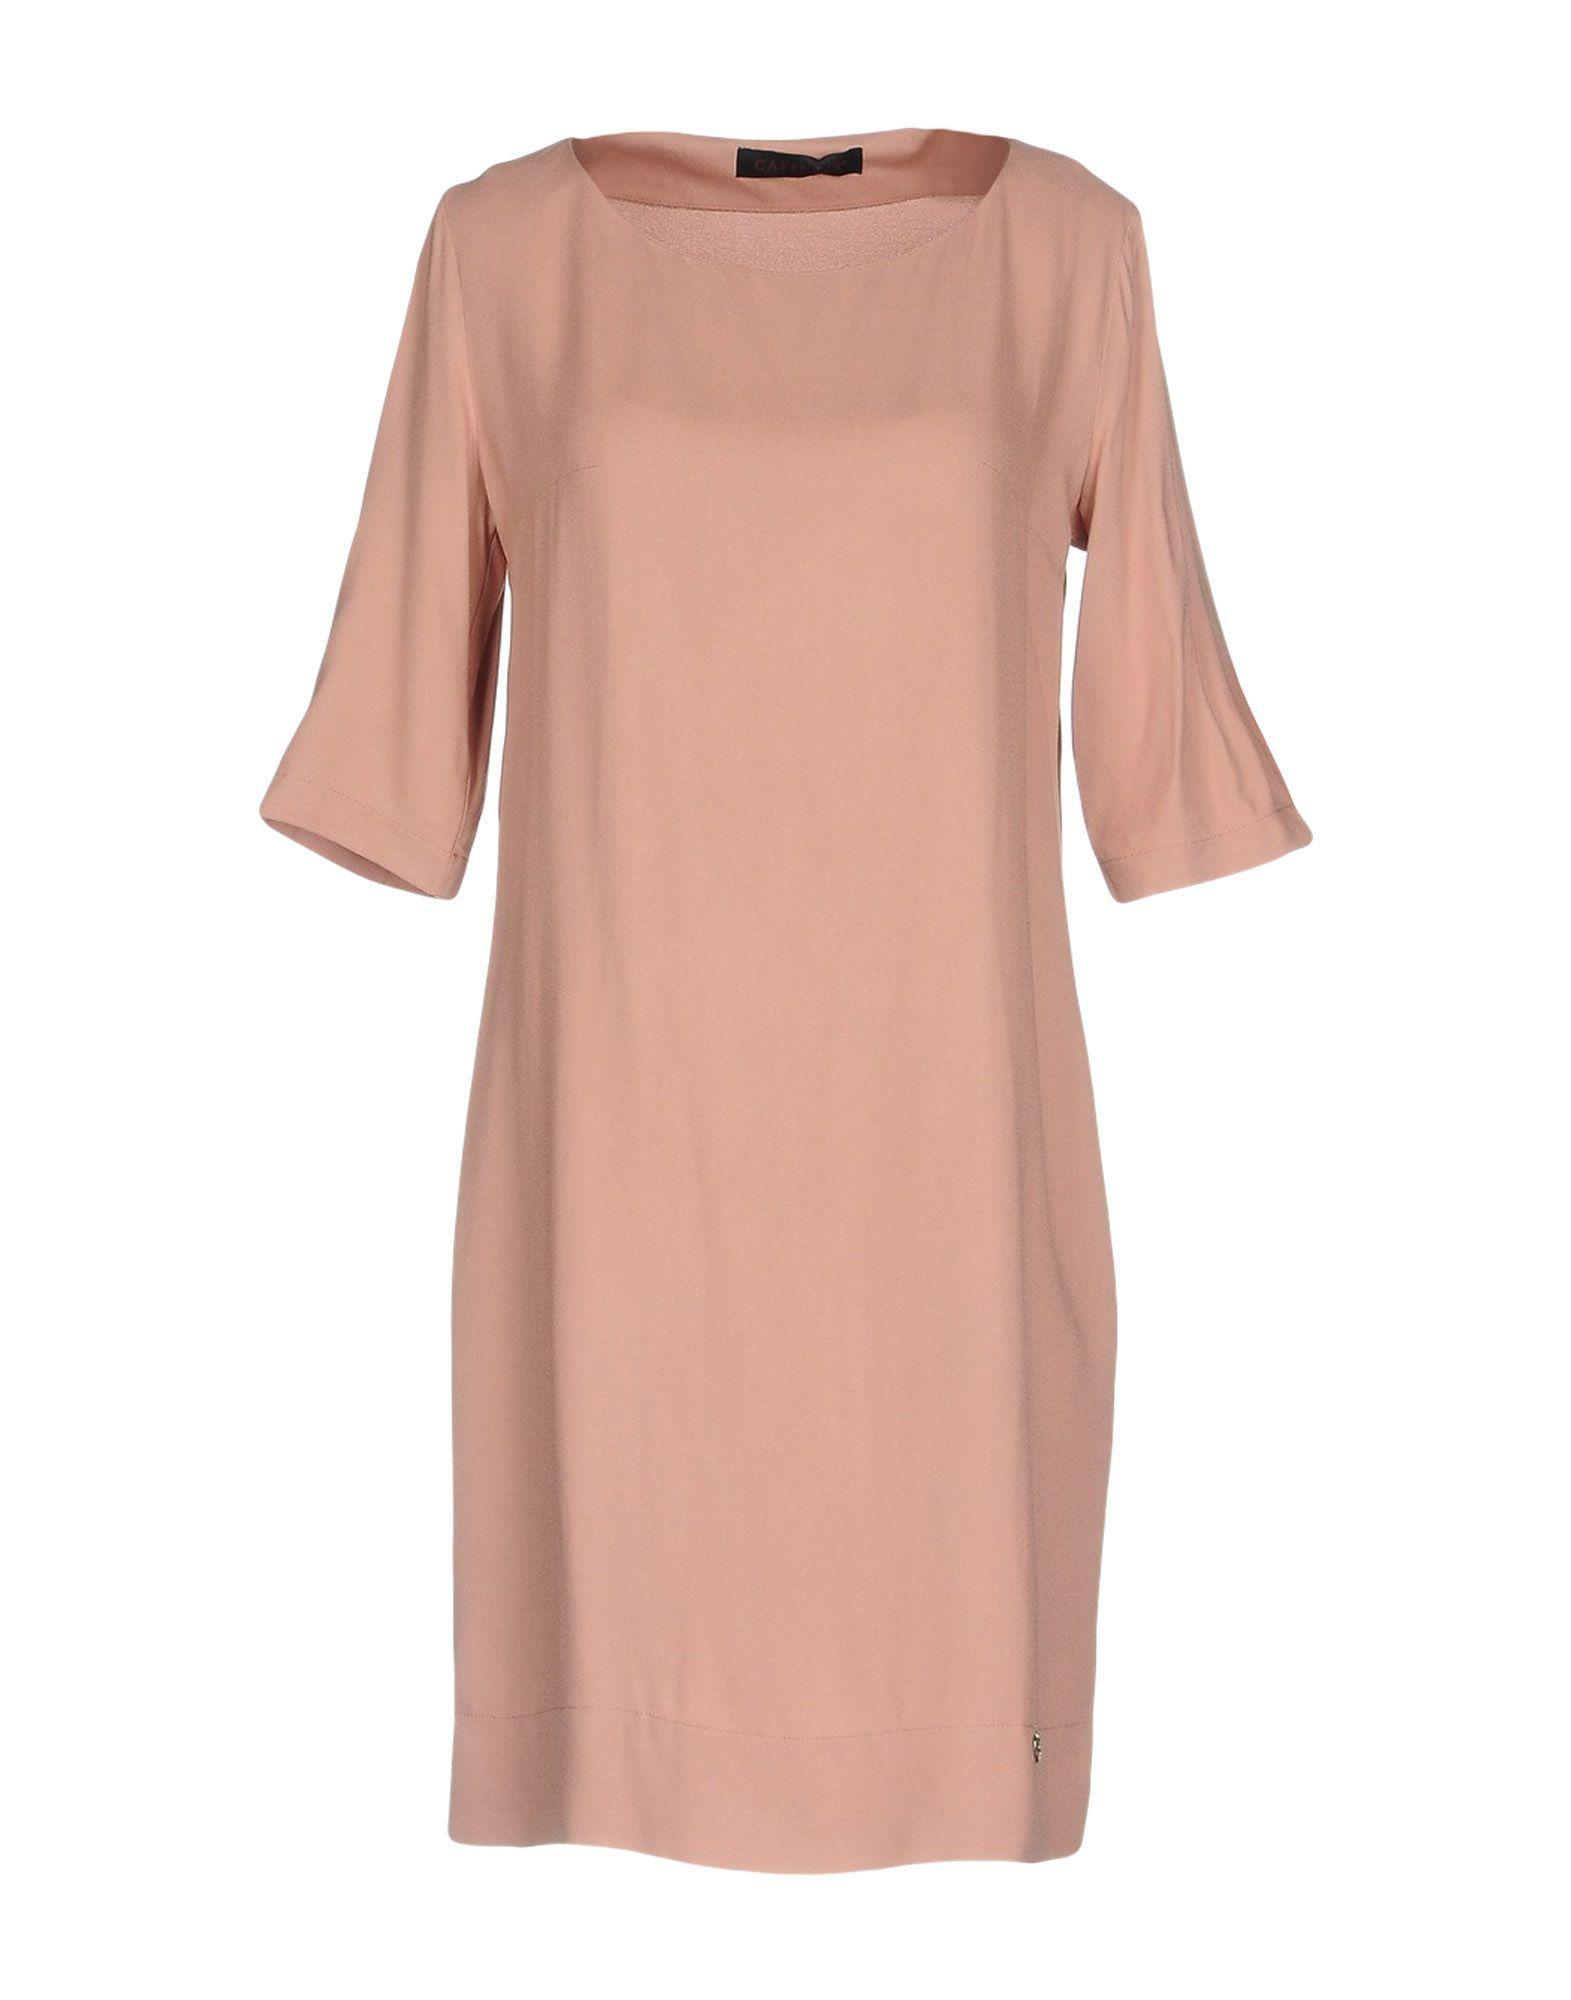 Cafenoir Sky Blue Short Sleeve Dress